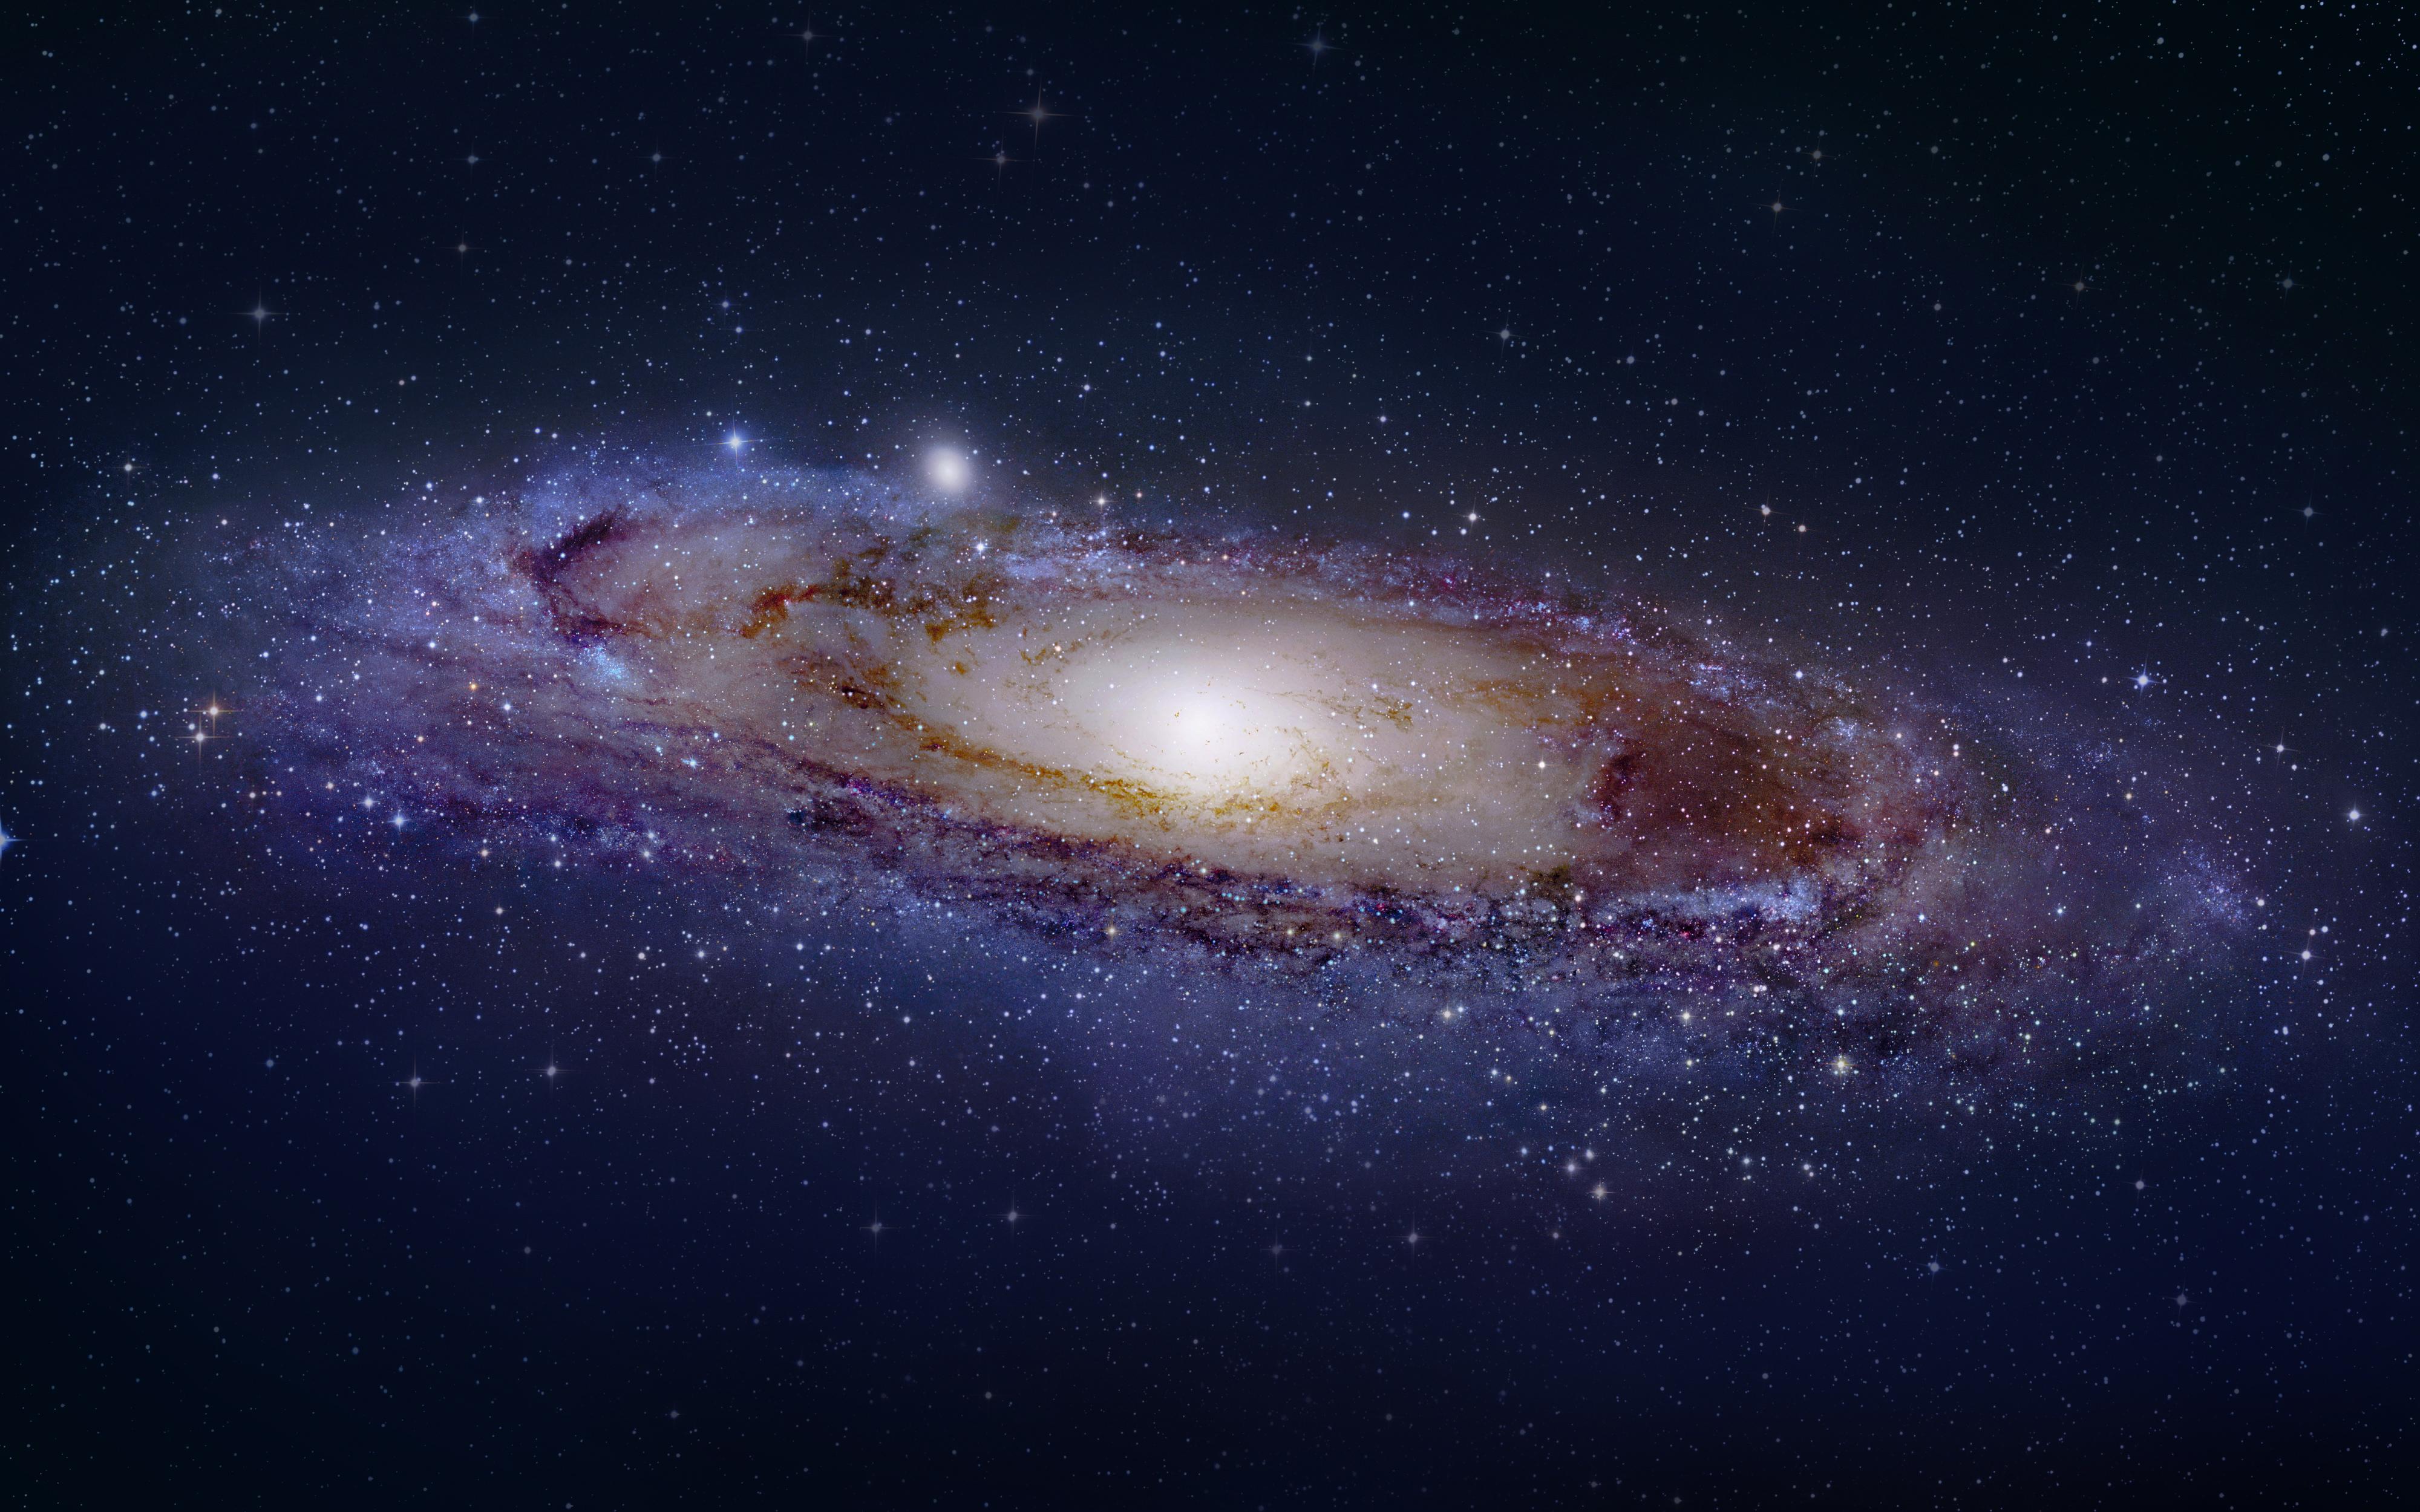 Galaxy Space Universe Andromeda Stars, HD Digital Universe ...